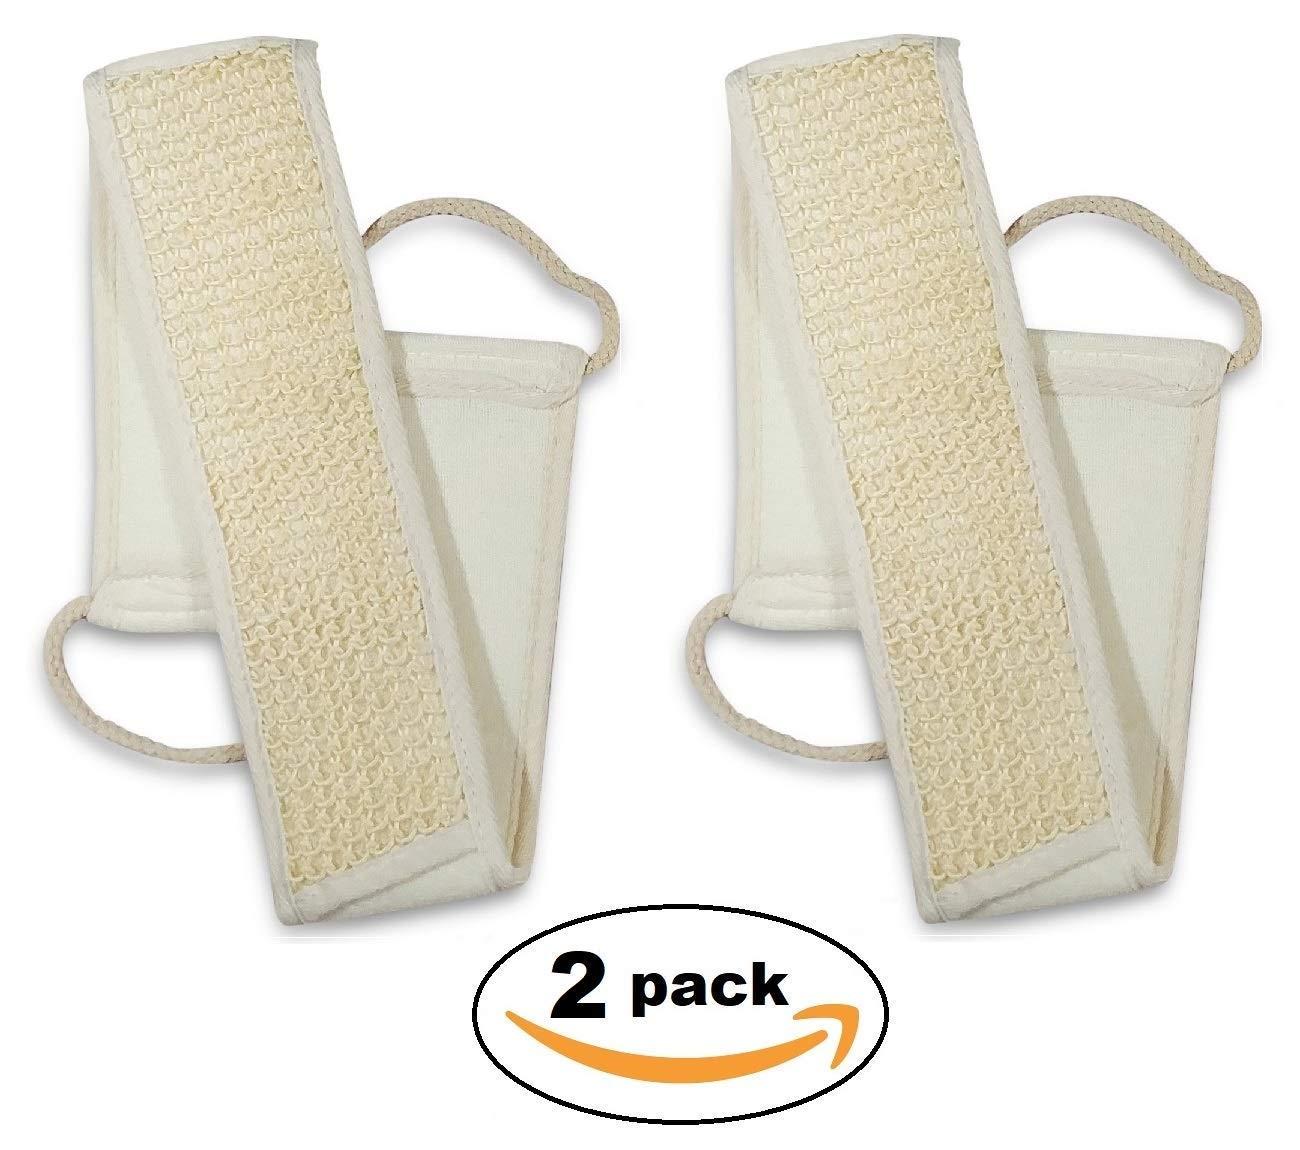 Dry Brush & Skin Exfoliating Set - VEGAN. NO Boar Bristles - Natural 5 in 1 kit - Body Brush, Foot Brush & Pumice Stone, Loofah Back Scrubber, Face Konjac Sponge, Bath Gloves. Reduce Cellulite Sense Sation